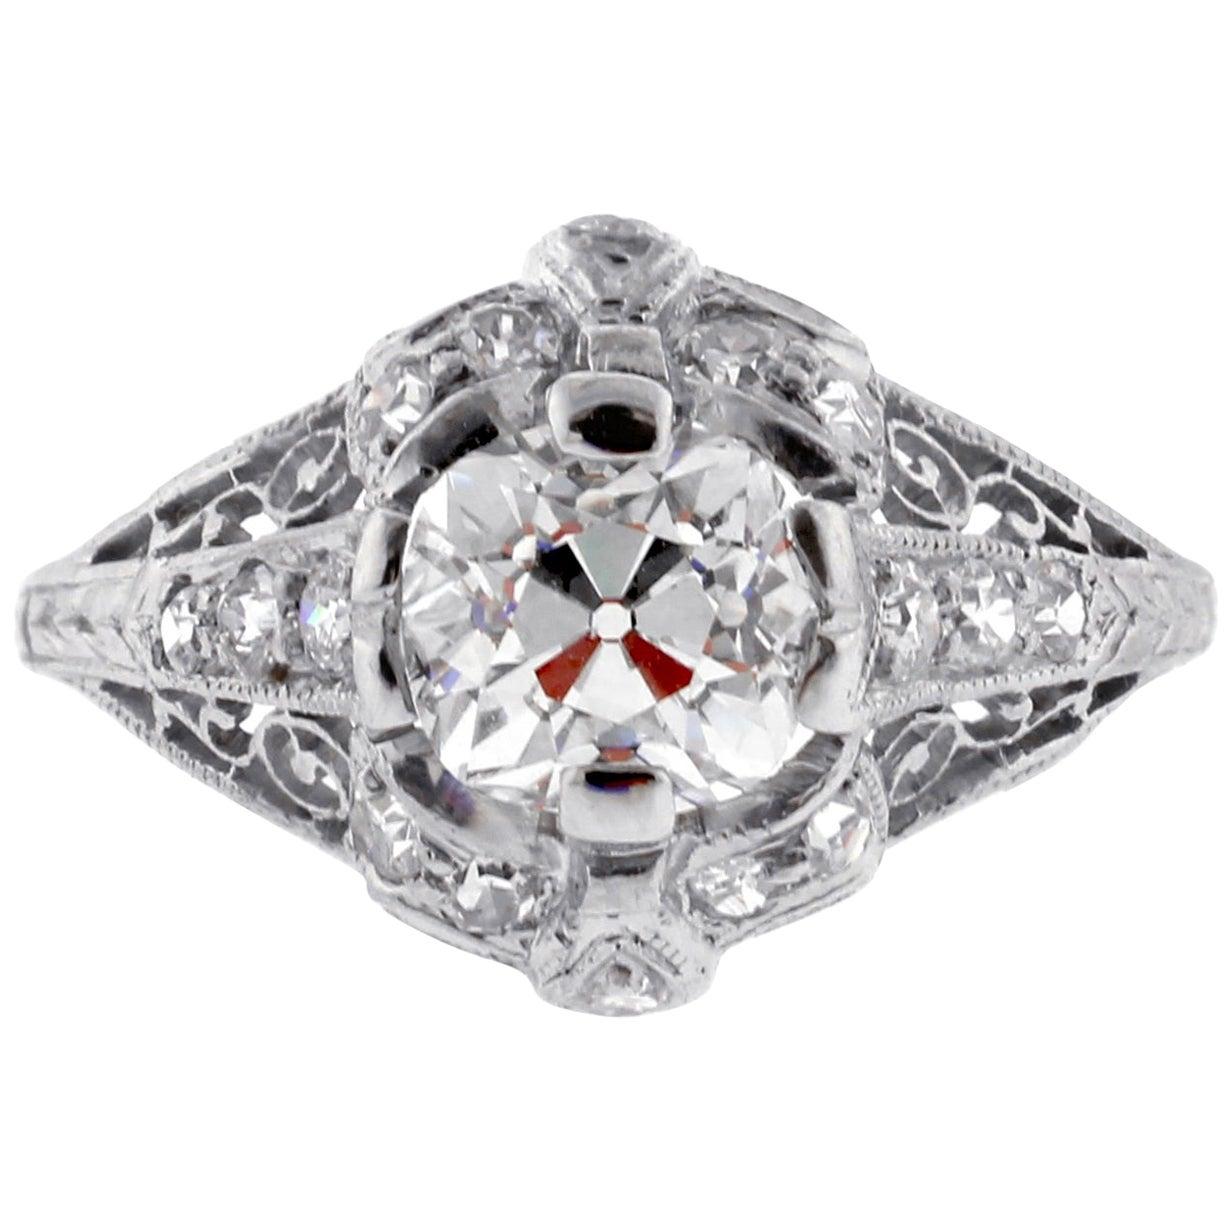 Edwardian Old Mine Cut Diamond Engagement Ring